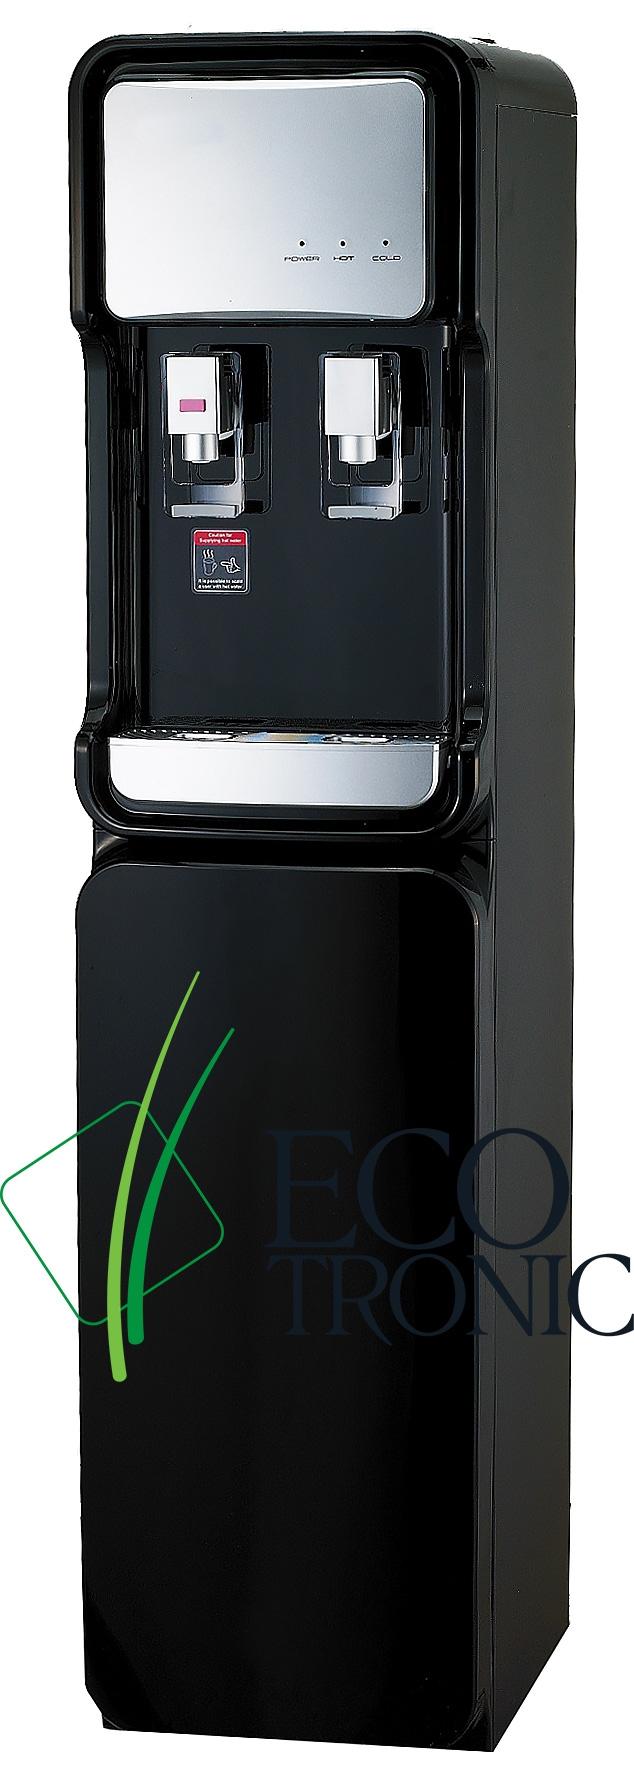 Пурифайер Ecotronic V11-U4L Black - 1